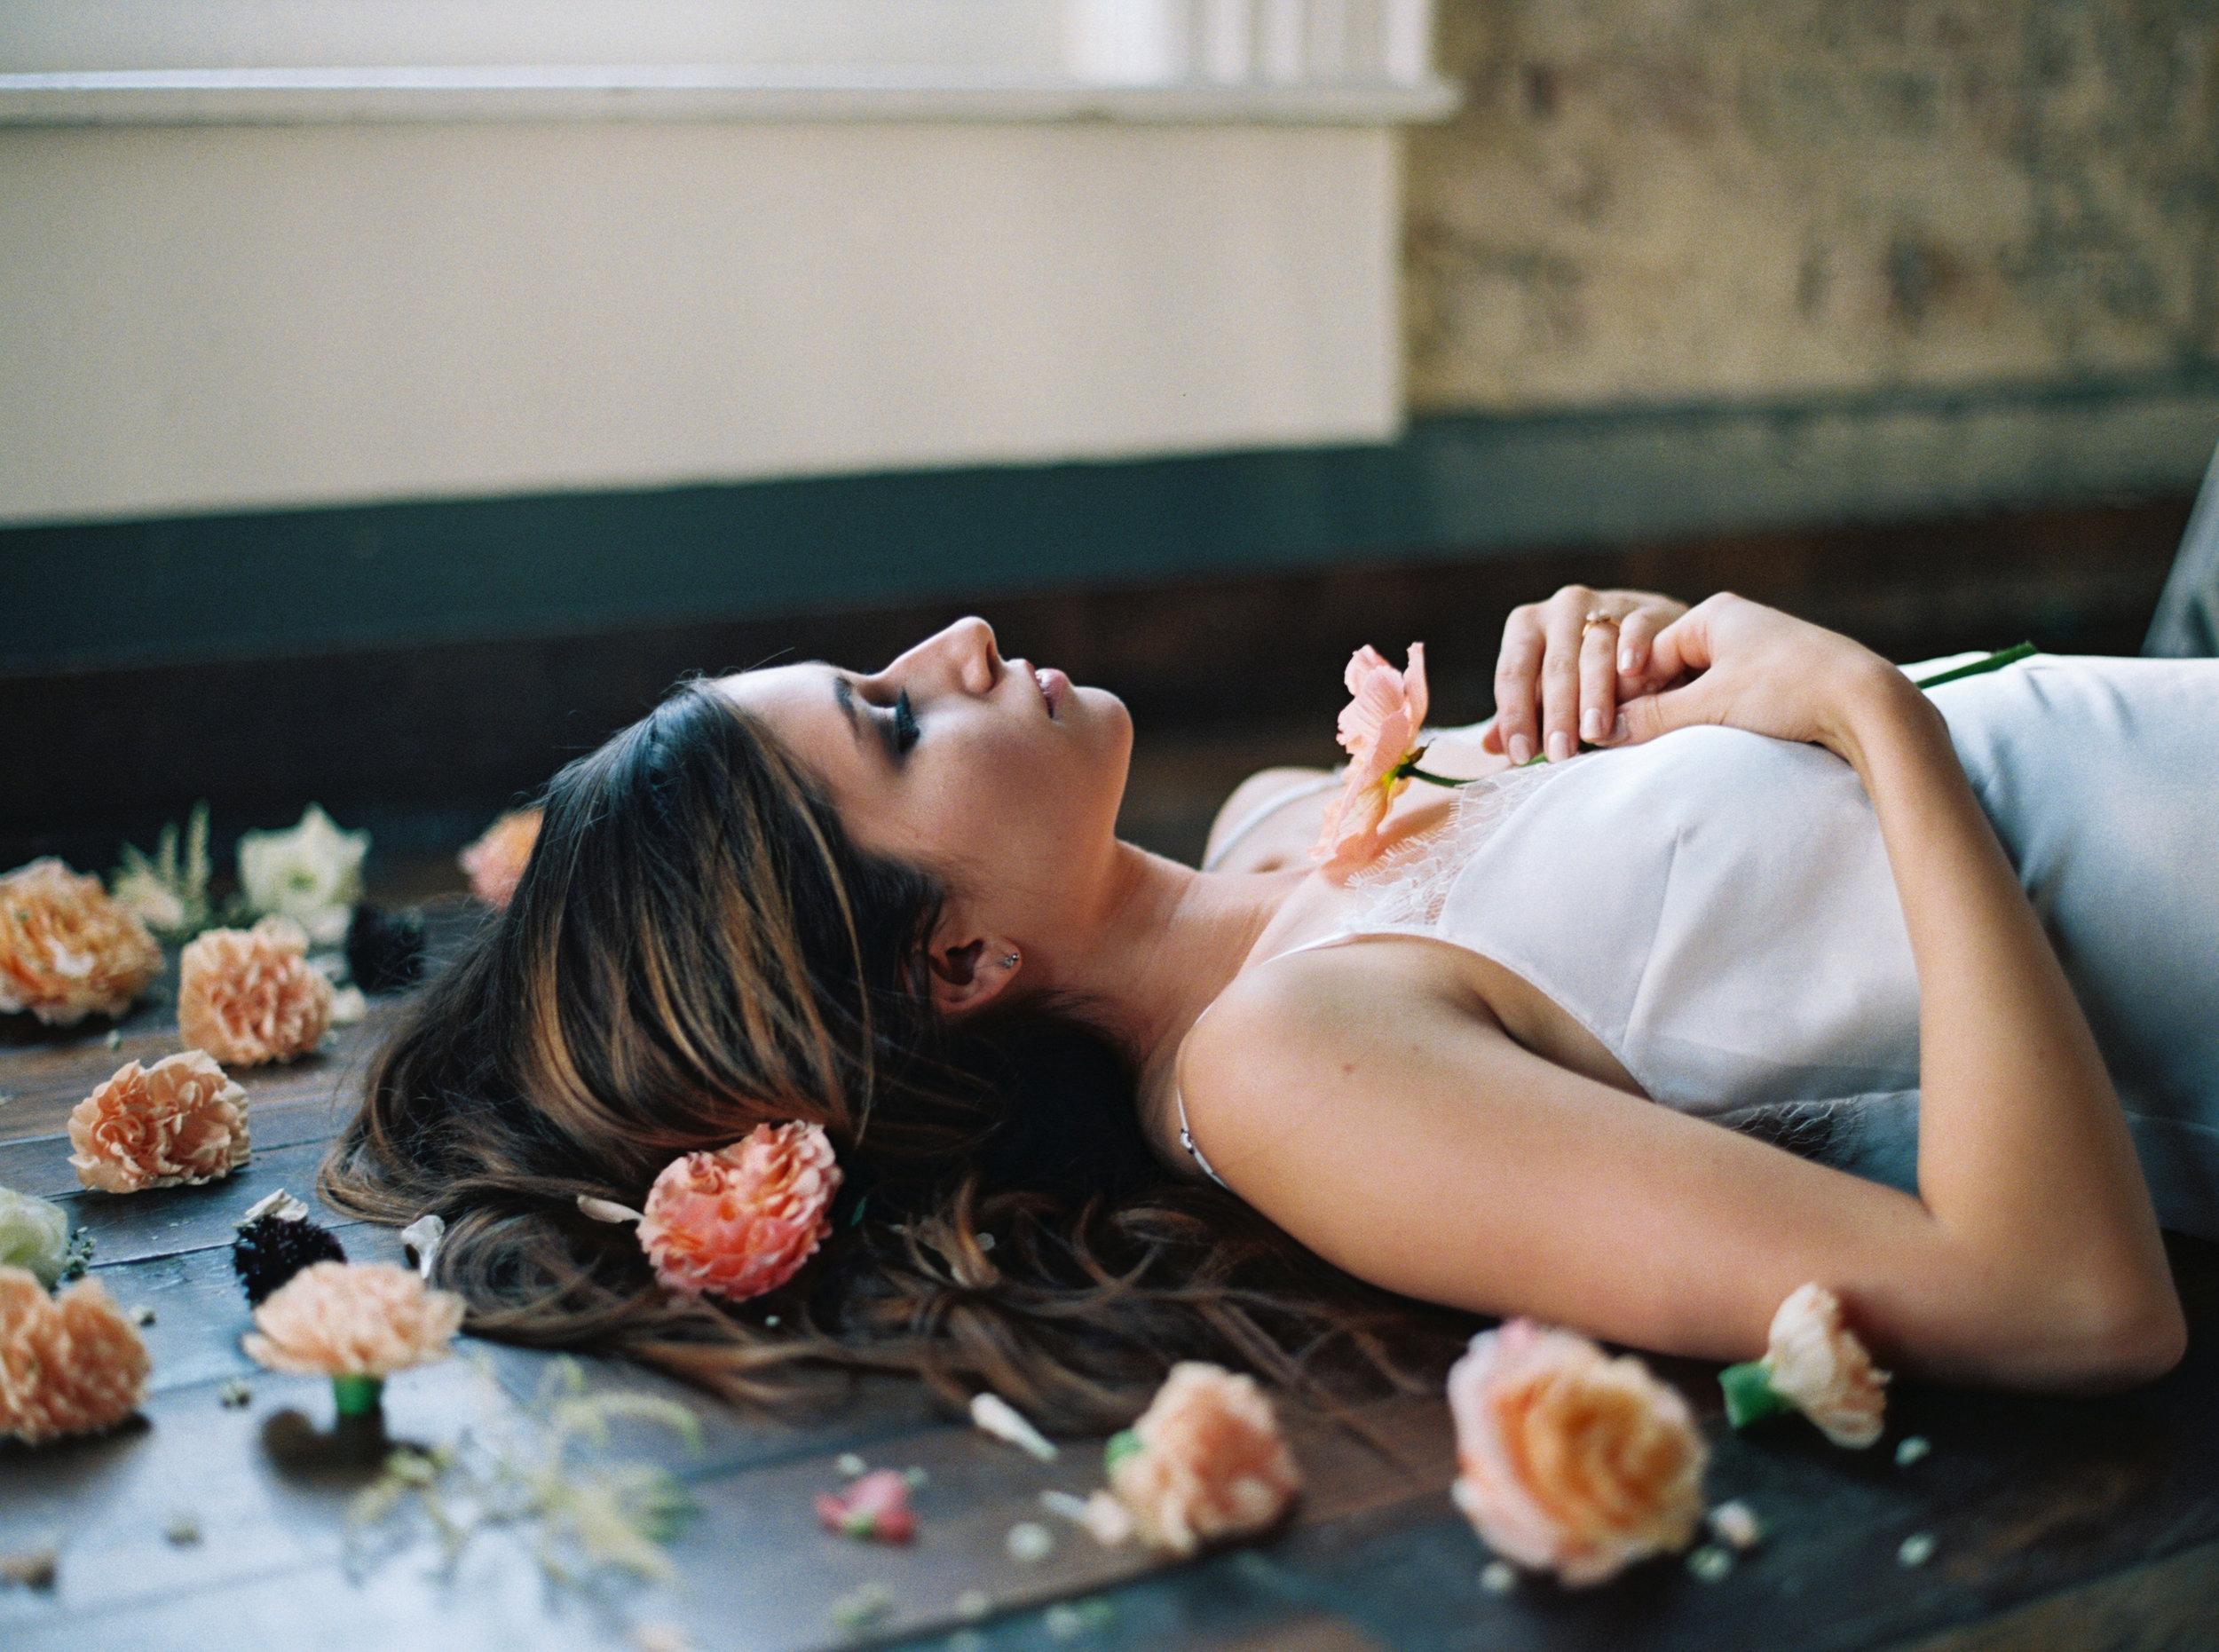 Cordell_Nashville_In_Bloom_Editorial_Boudoir_Abigail_Malone_Photography-171.jpg